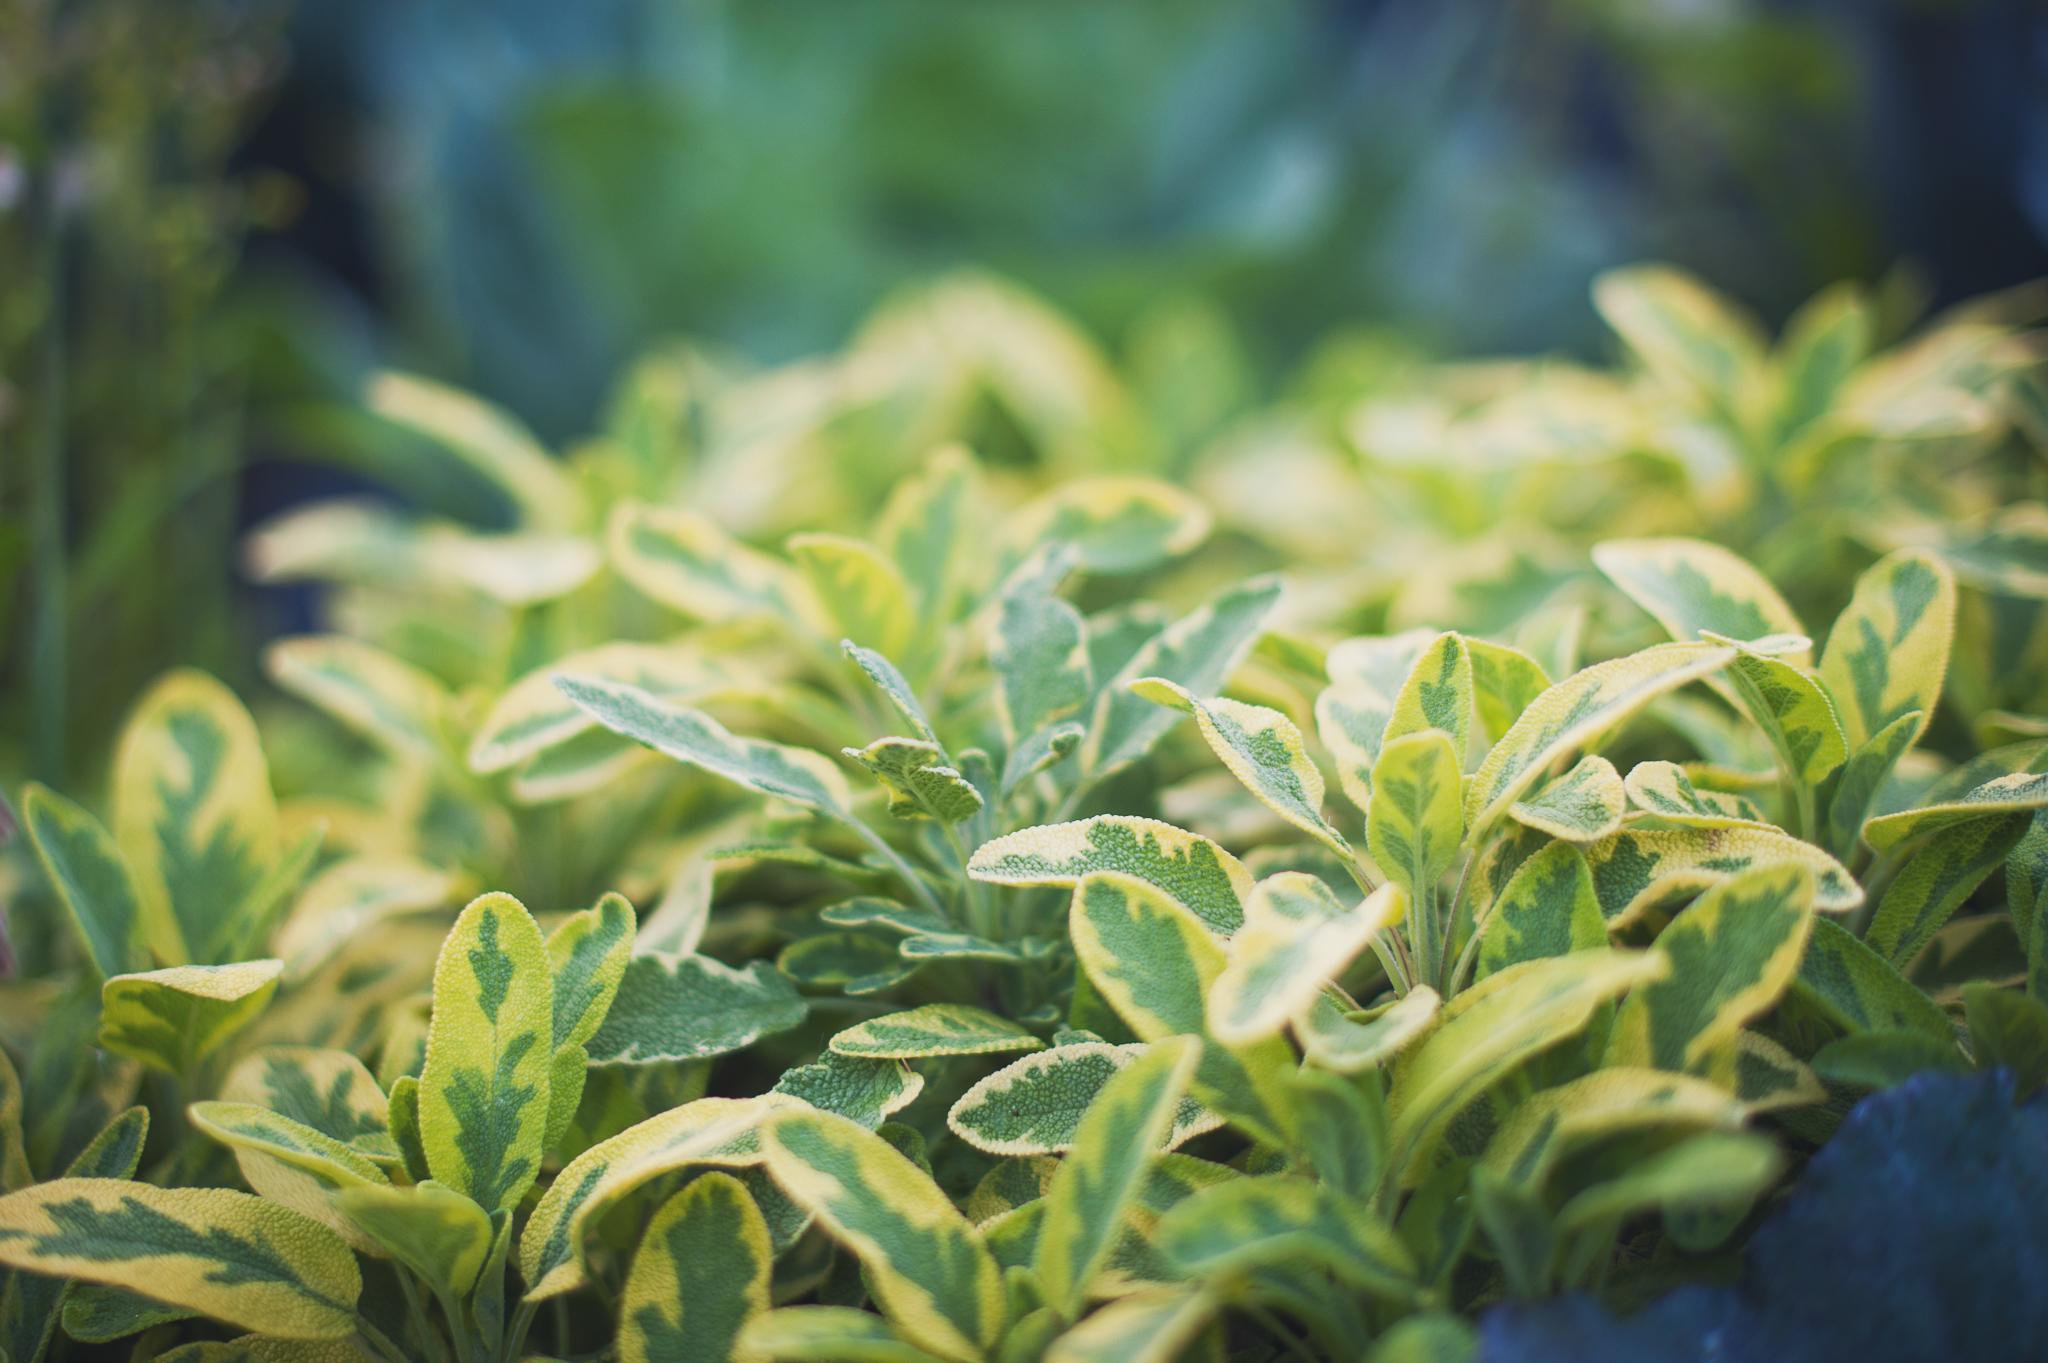 sage-herb-plant-montreal-botanical-garden-photographer-lifestyle-alex-tran